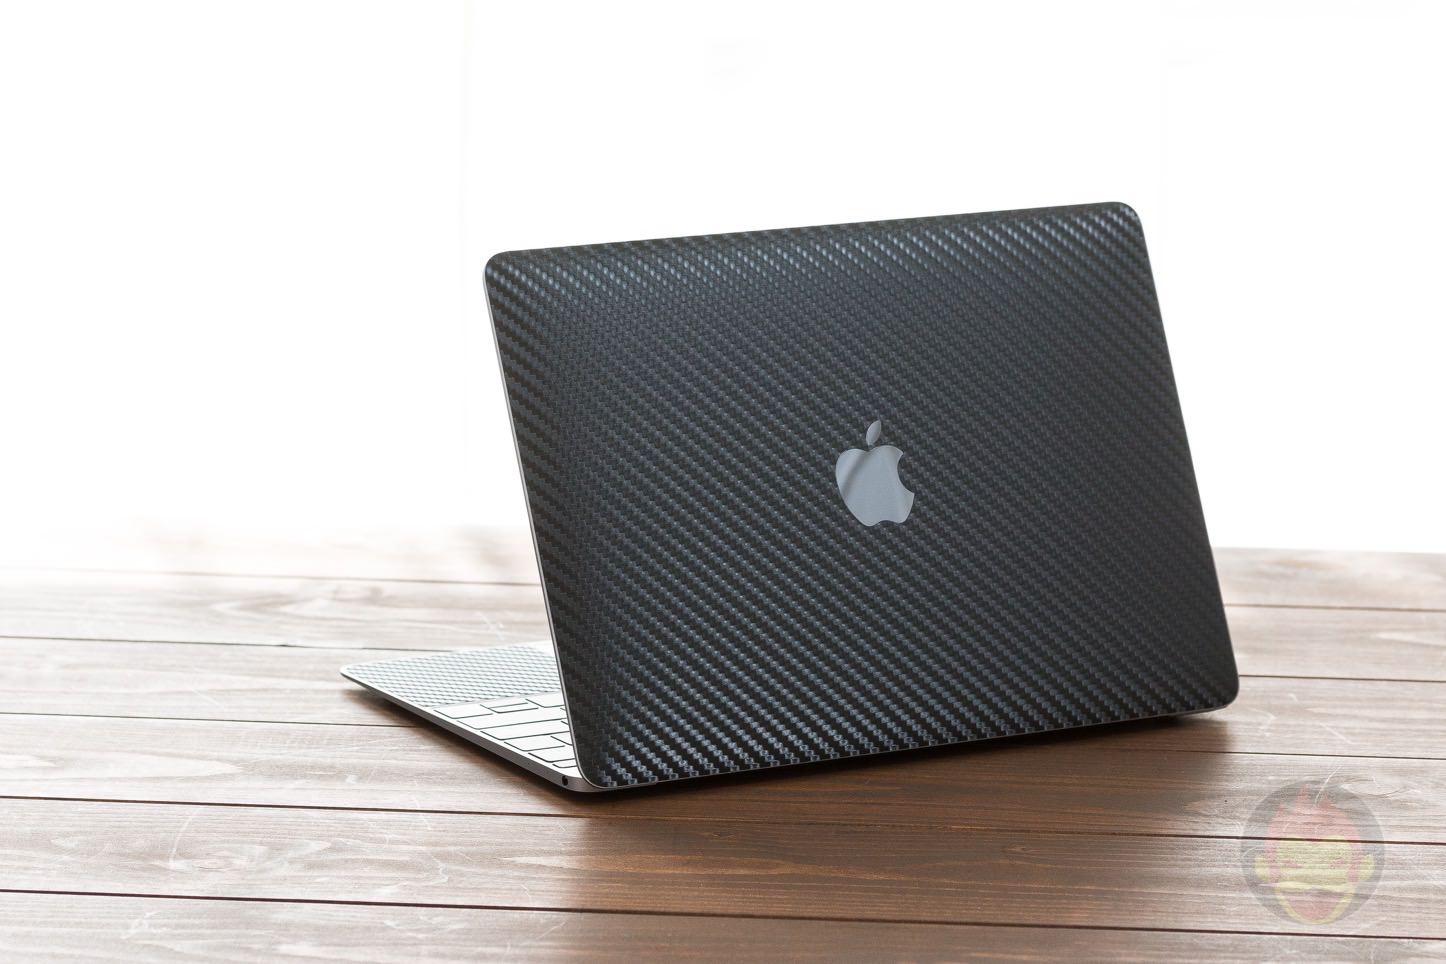 2016-MacBook-1.3GHz-Review-168.jpg